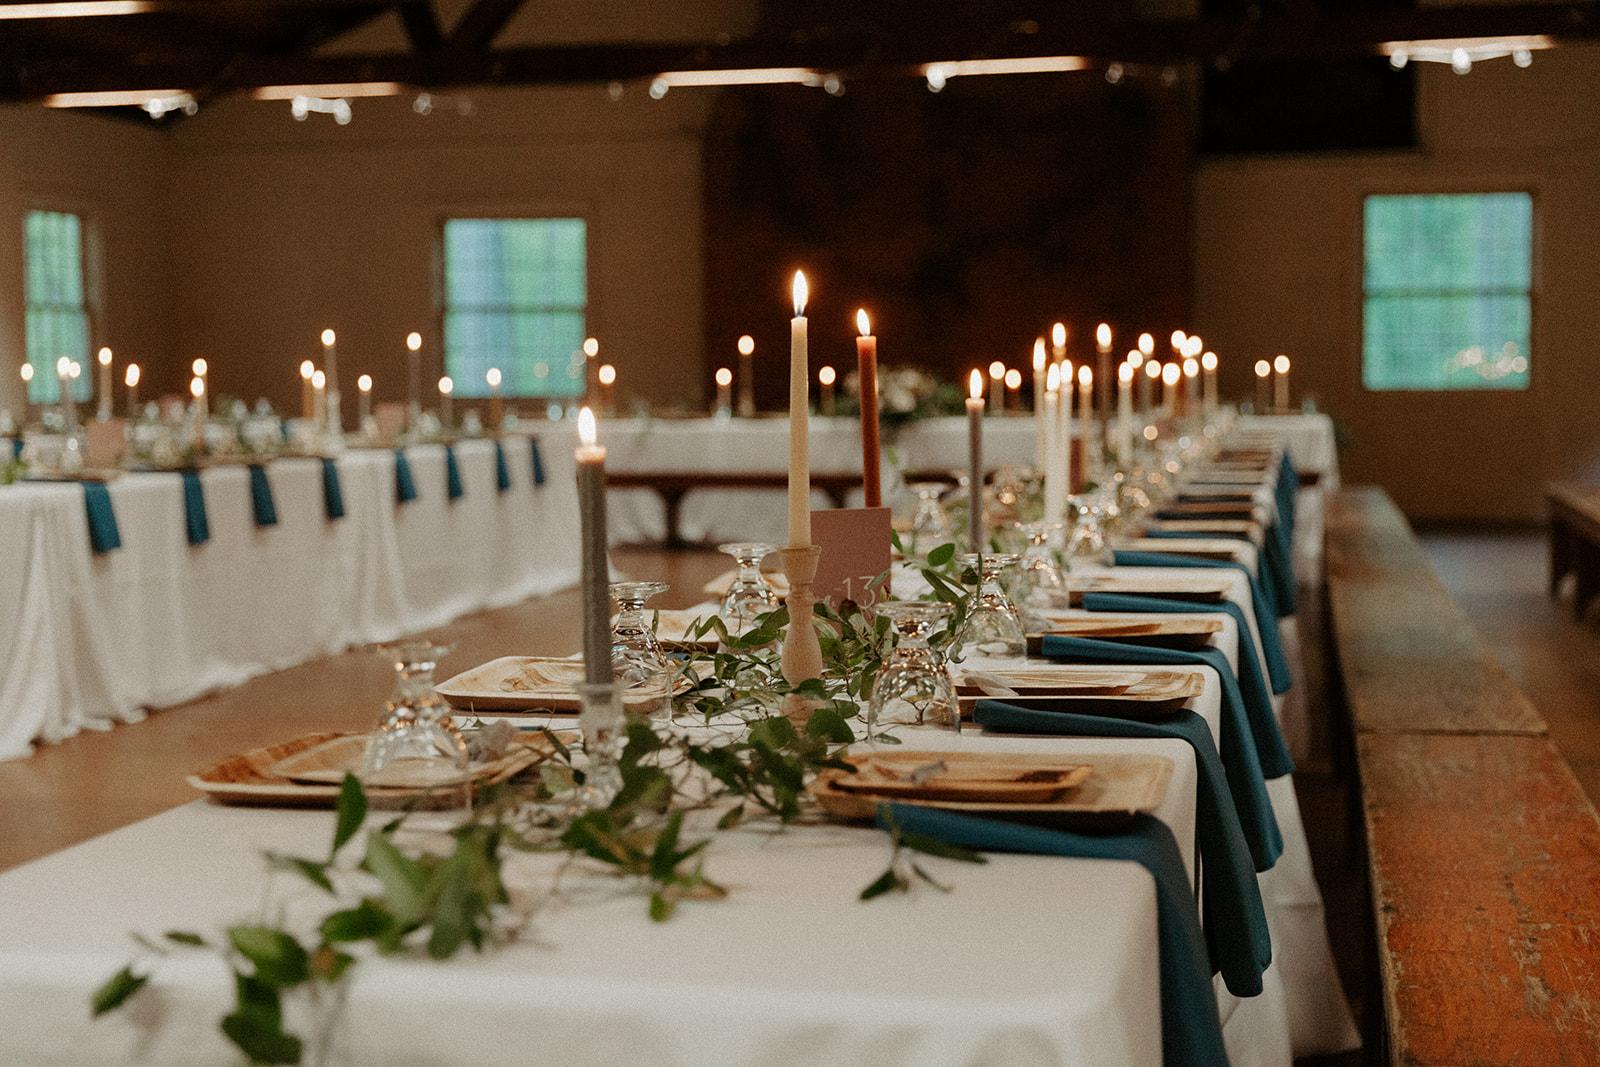 camp_wokanda_peoria_illinois_wedding_photographer_wright_photographs_bliese_0855.jpg